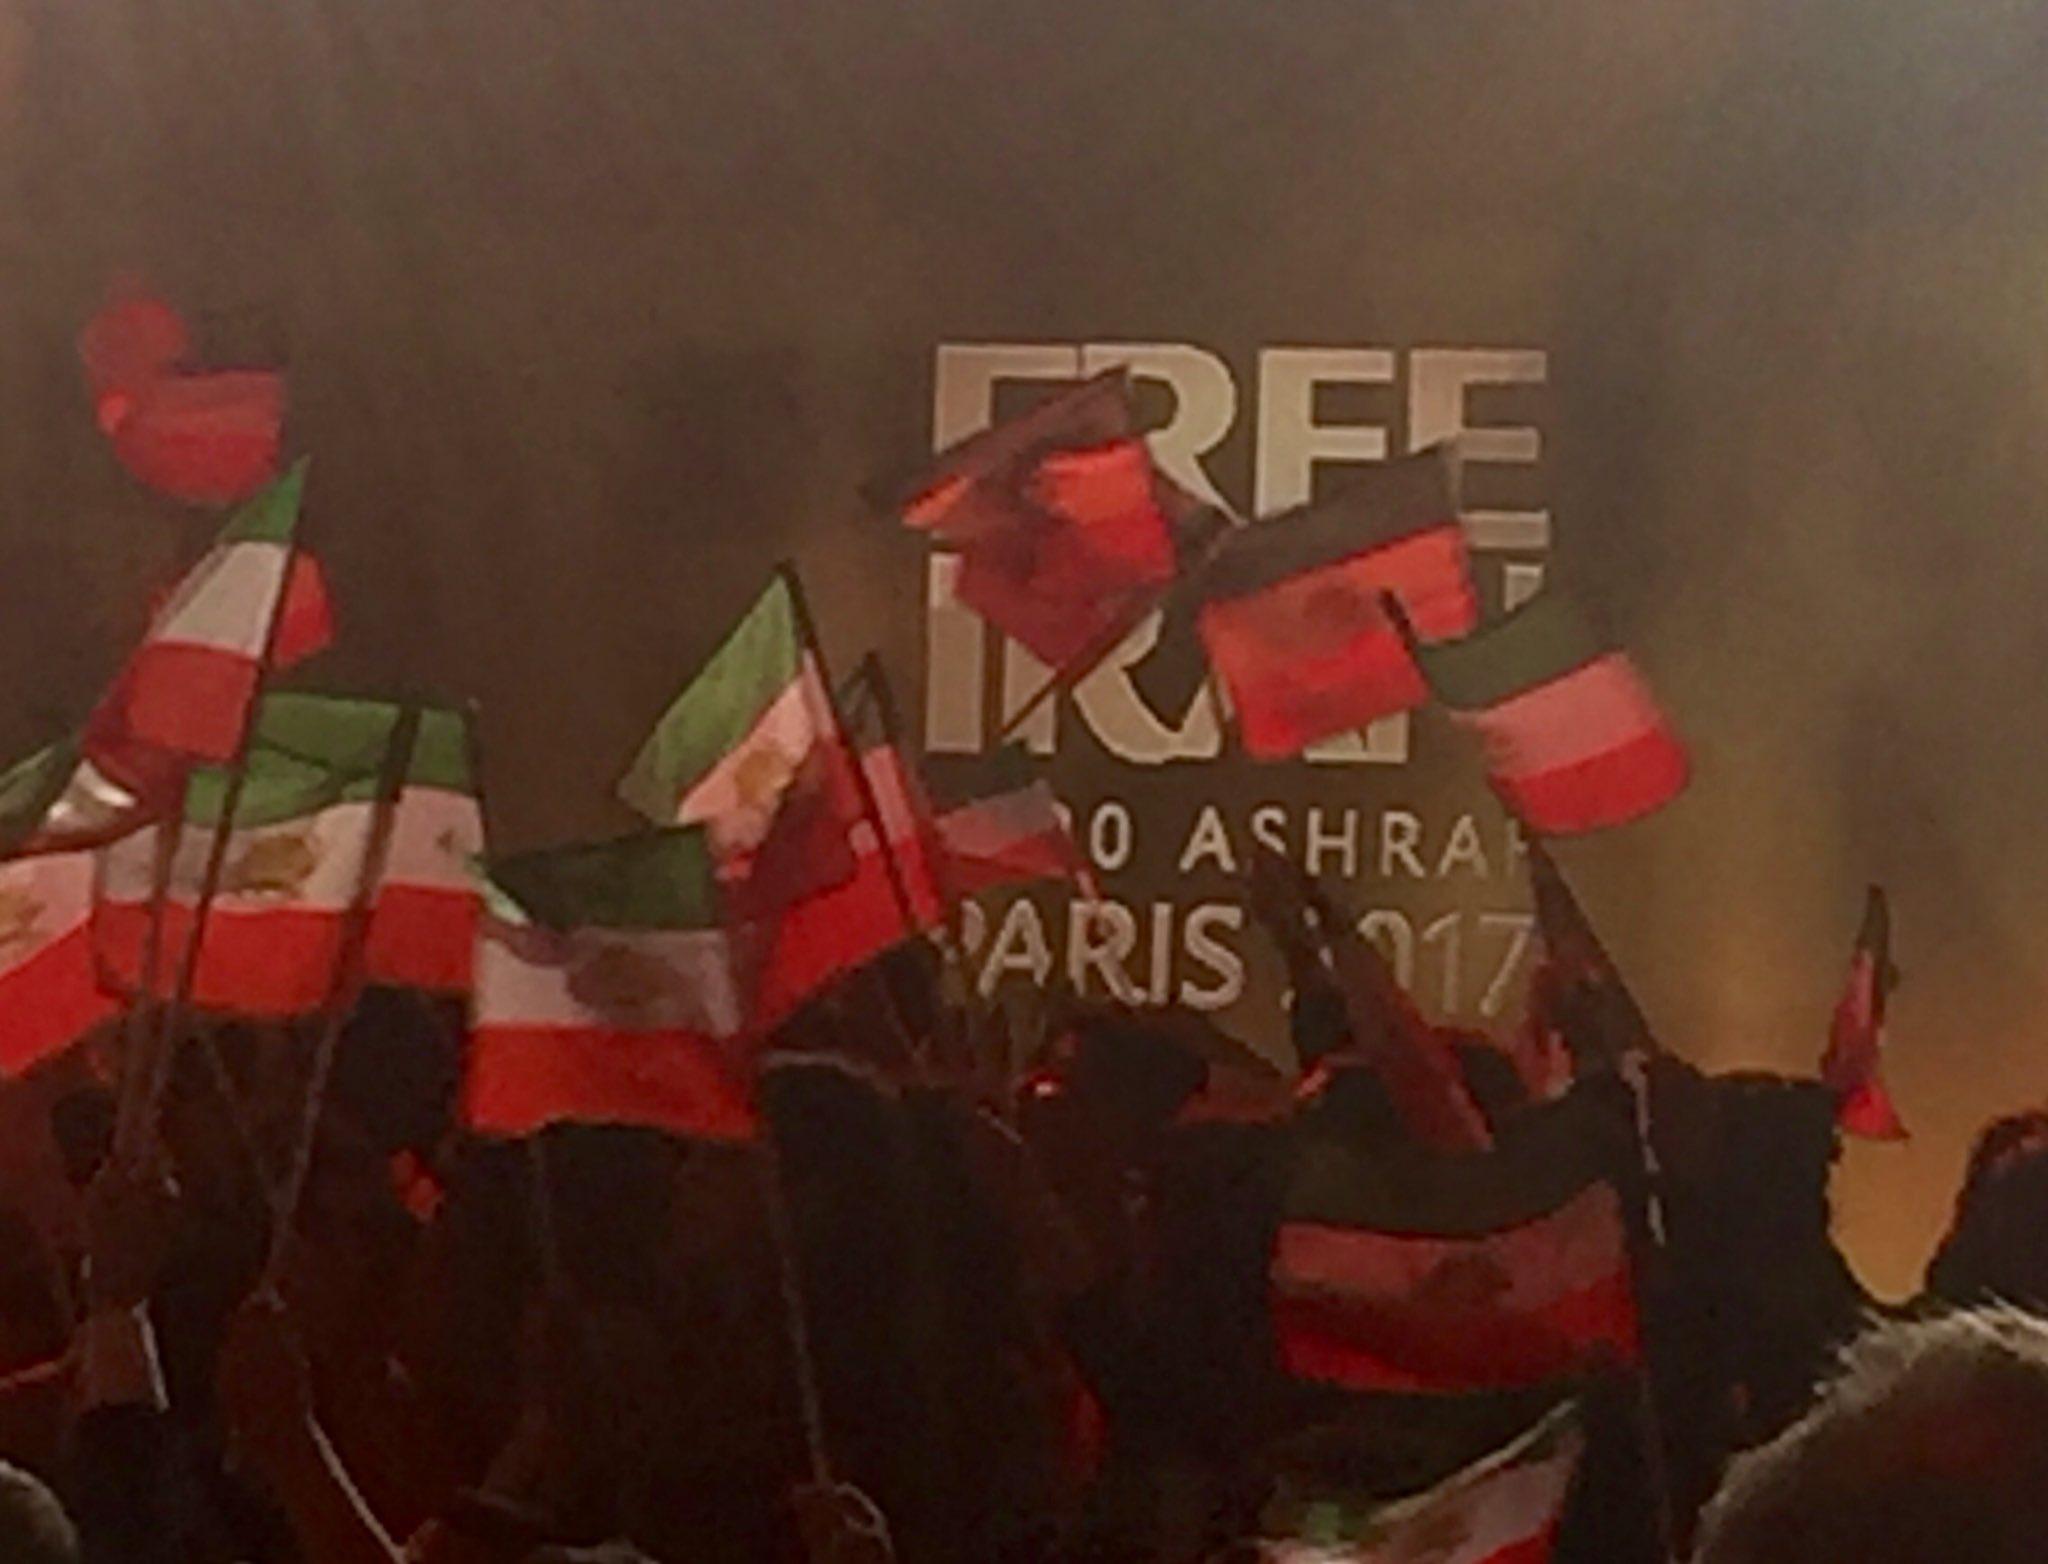 Once again I'm here for the 5th time  telling #FreeIran https://t.co/lwjpEsJ8yD